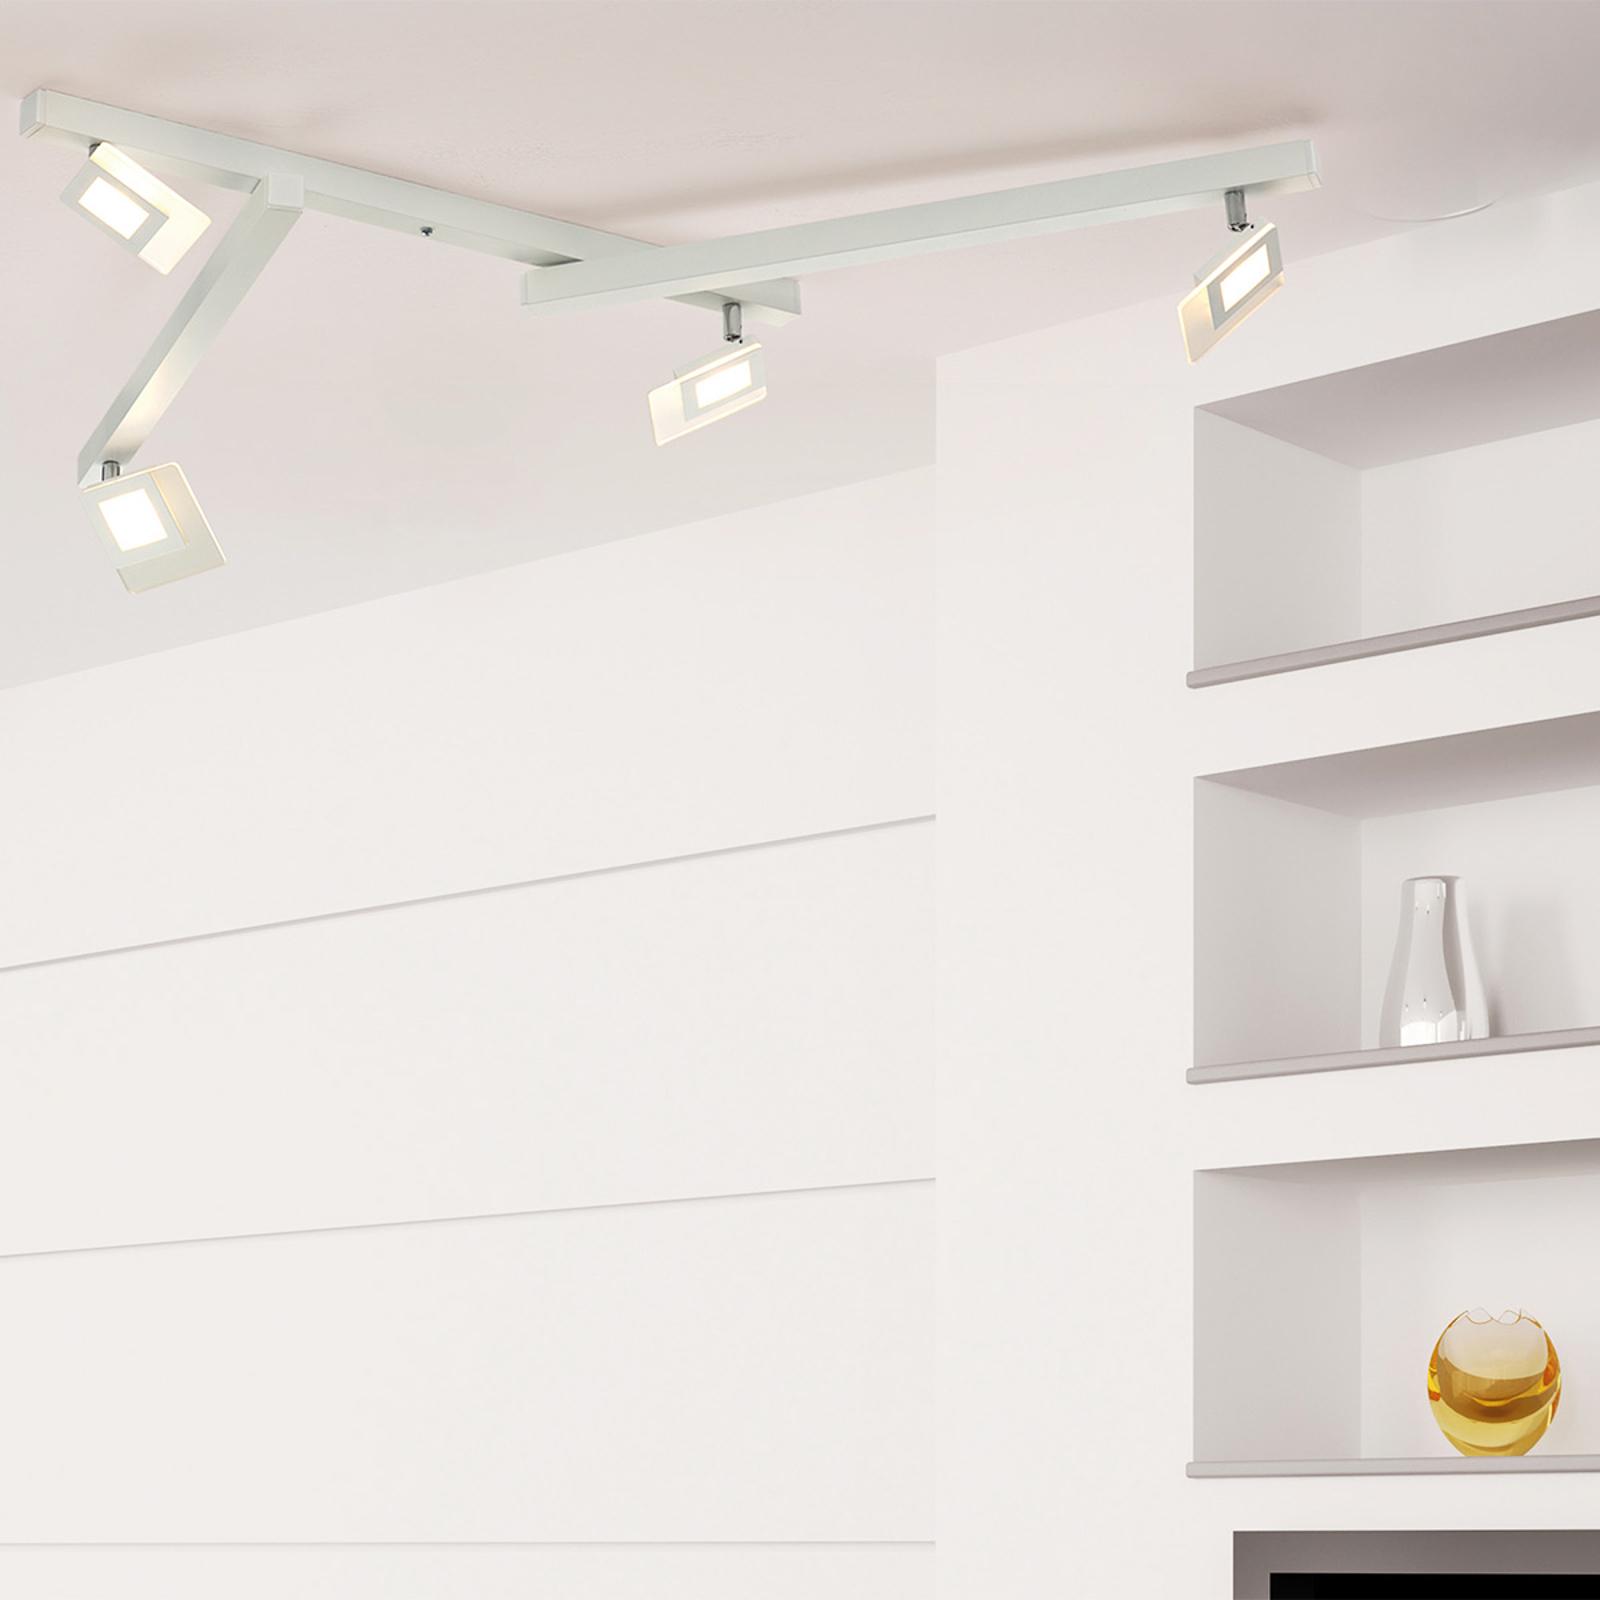 LED-loftslampen Line - 5 lyskilder, hvid